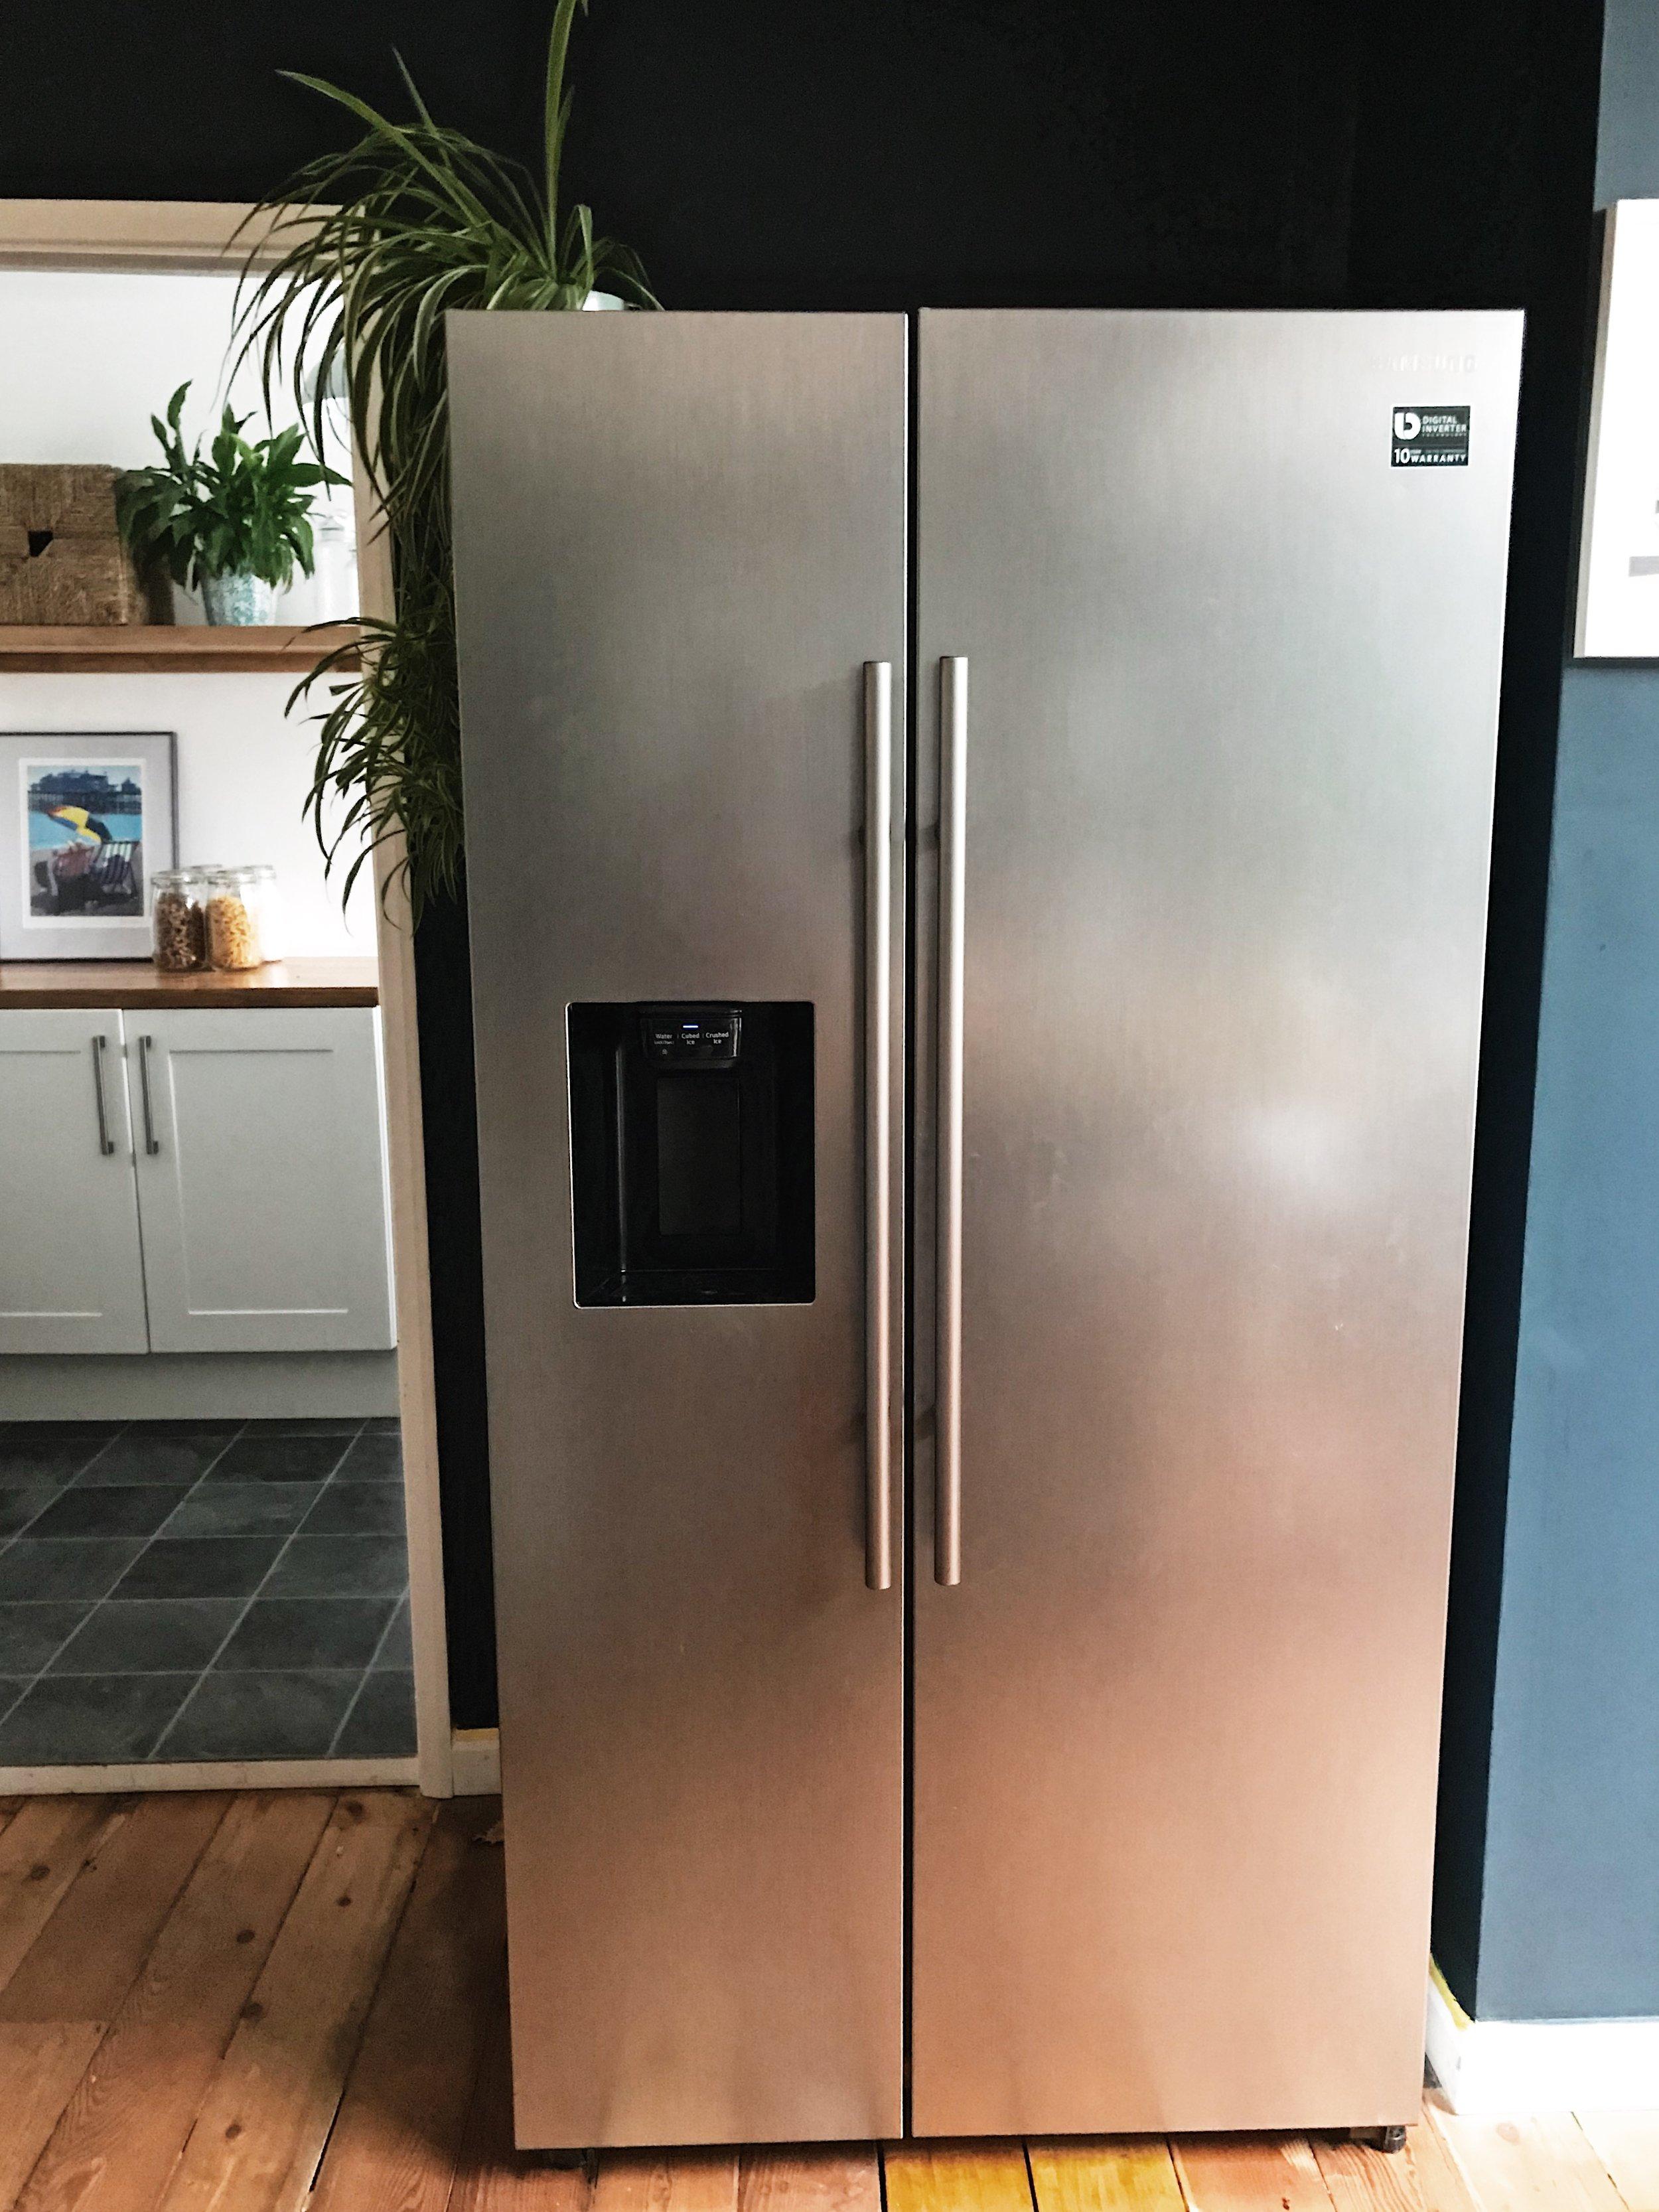 A very stylish and sleek Fridge Freezer (with a few kids hand prints on!)